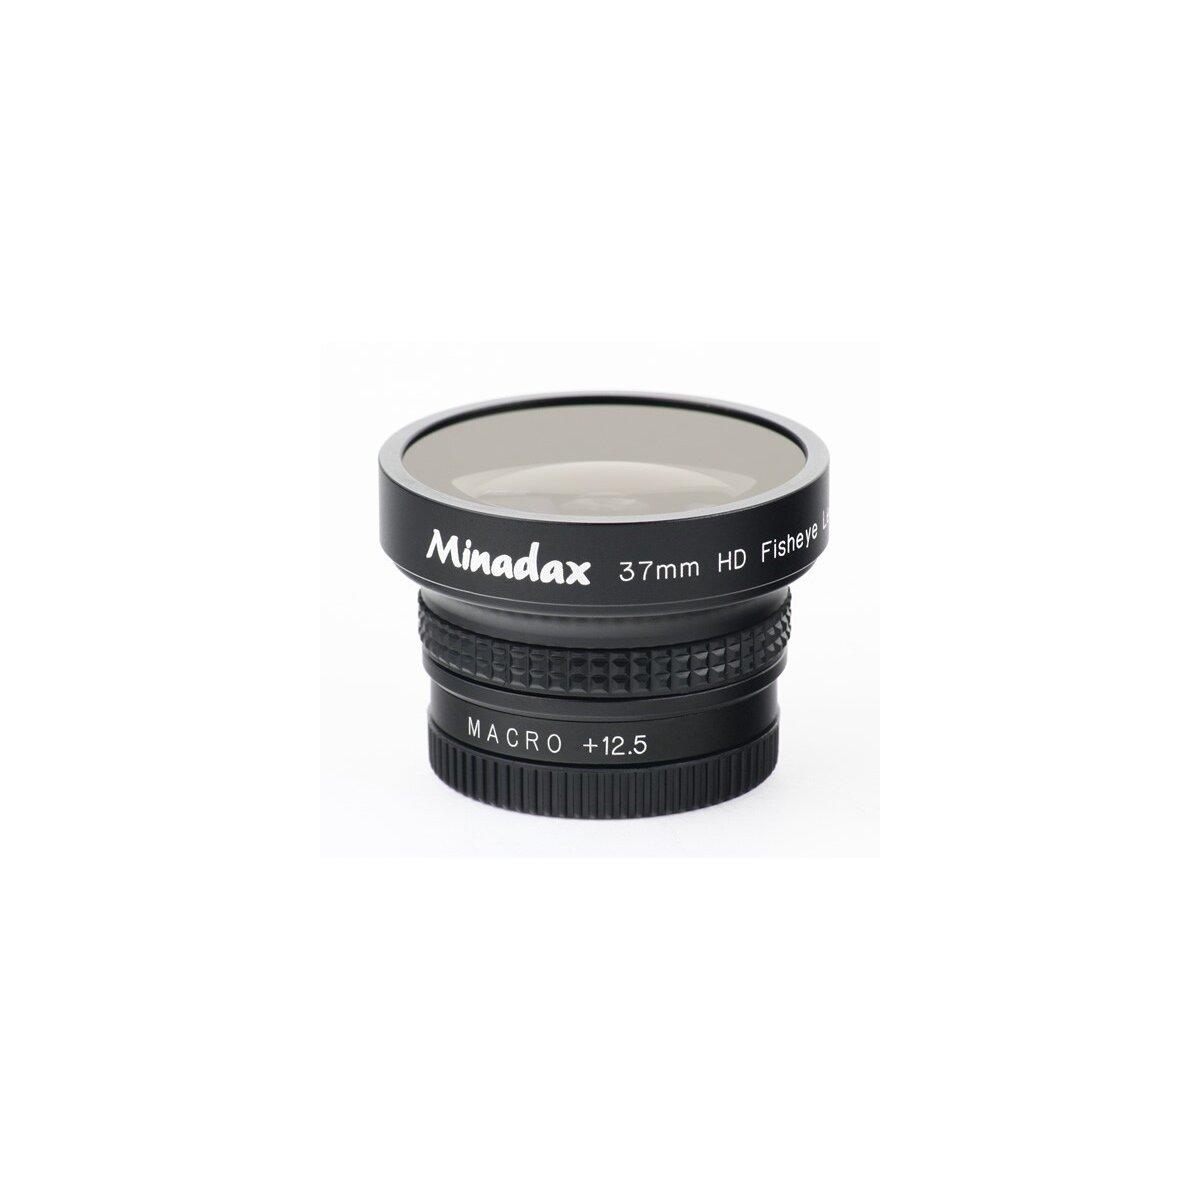 0.42x Minadax Fisheye Vorsatz fuer Panasonic HDC-SD5, HDC-SD9, HDC-SD100, HDC-SX5, HDC-HS9, HDC-HS100, VDR-D220, VDR-D250, VDR-D300, VDR-D310, SDR-S150, SDR-H80, SDR-H90